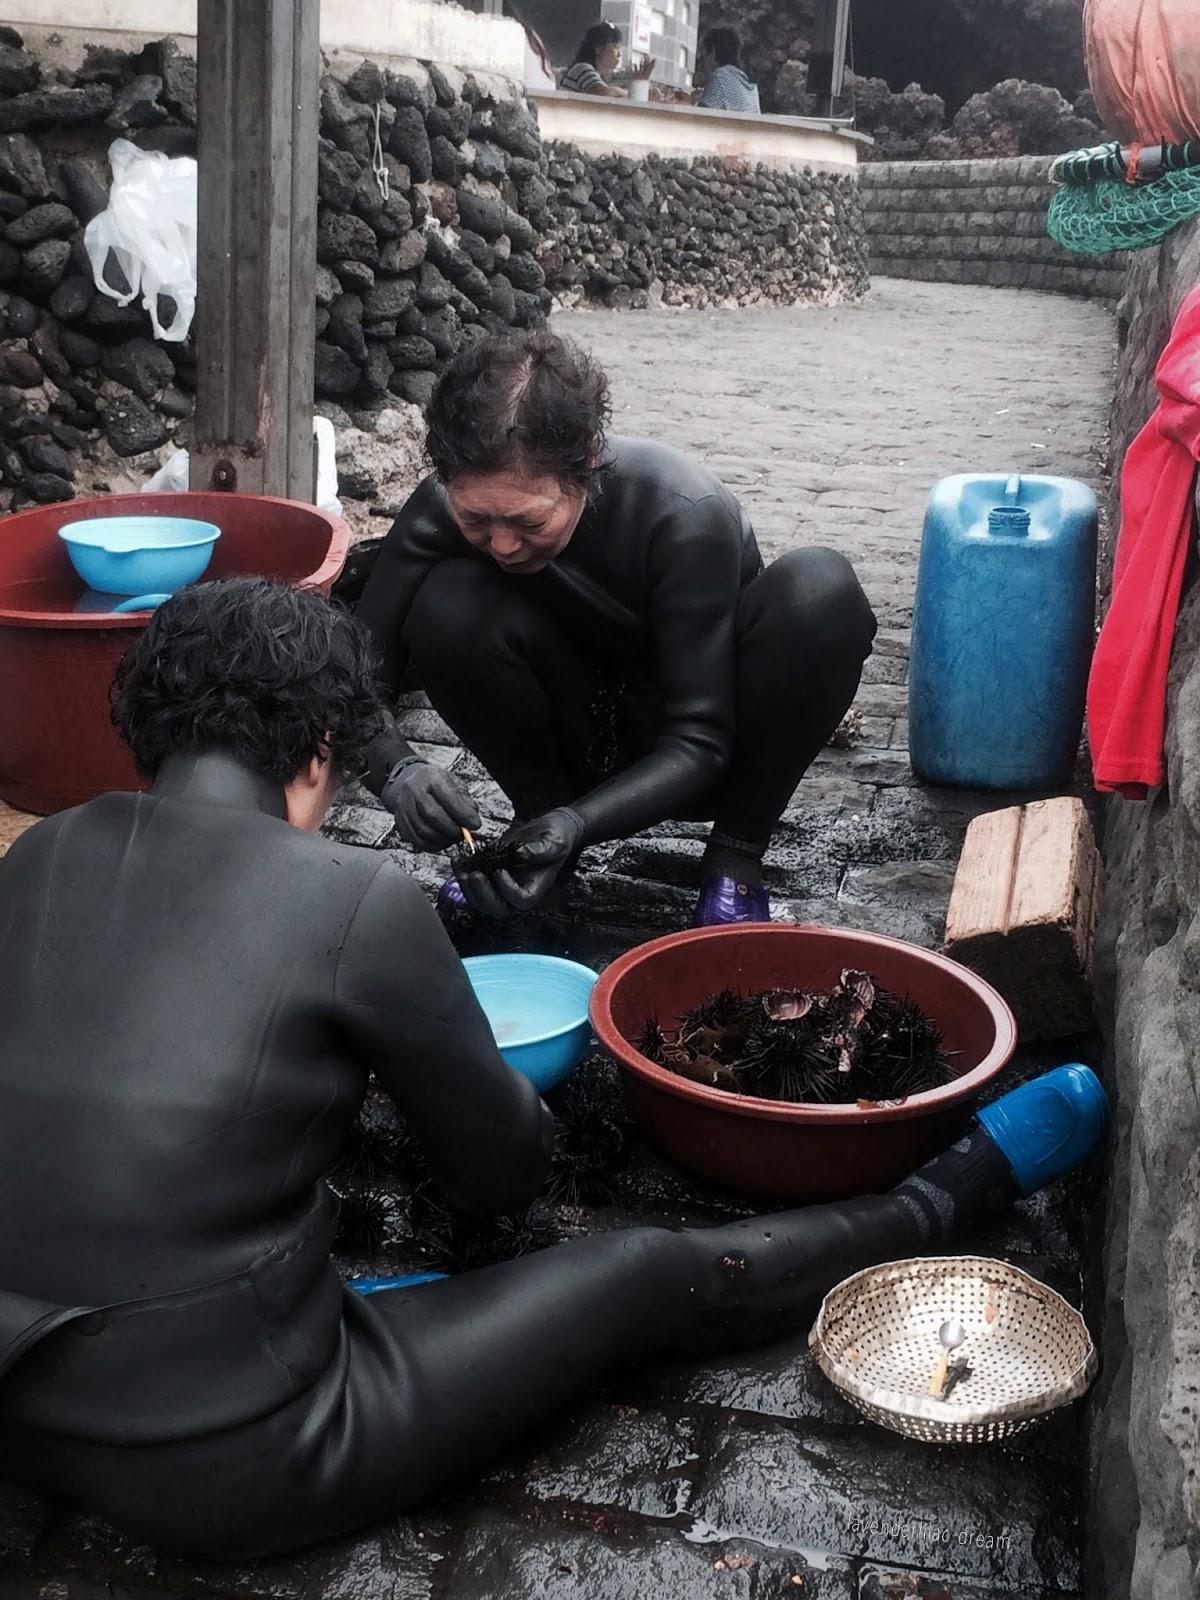 South Korea, Jeju Island, Yonsei University, YISS 2014, Sunrise Peak female divers